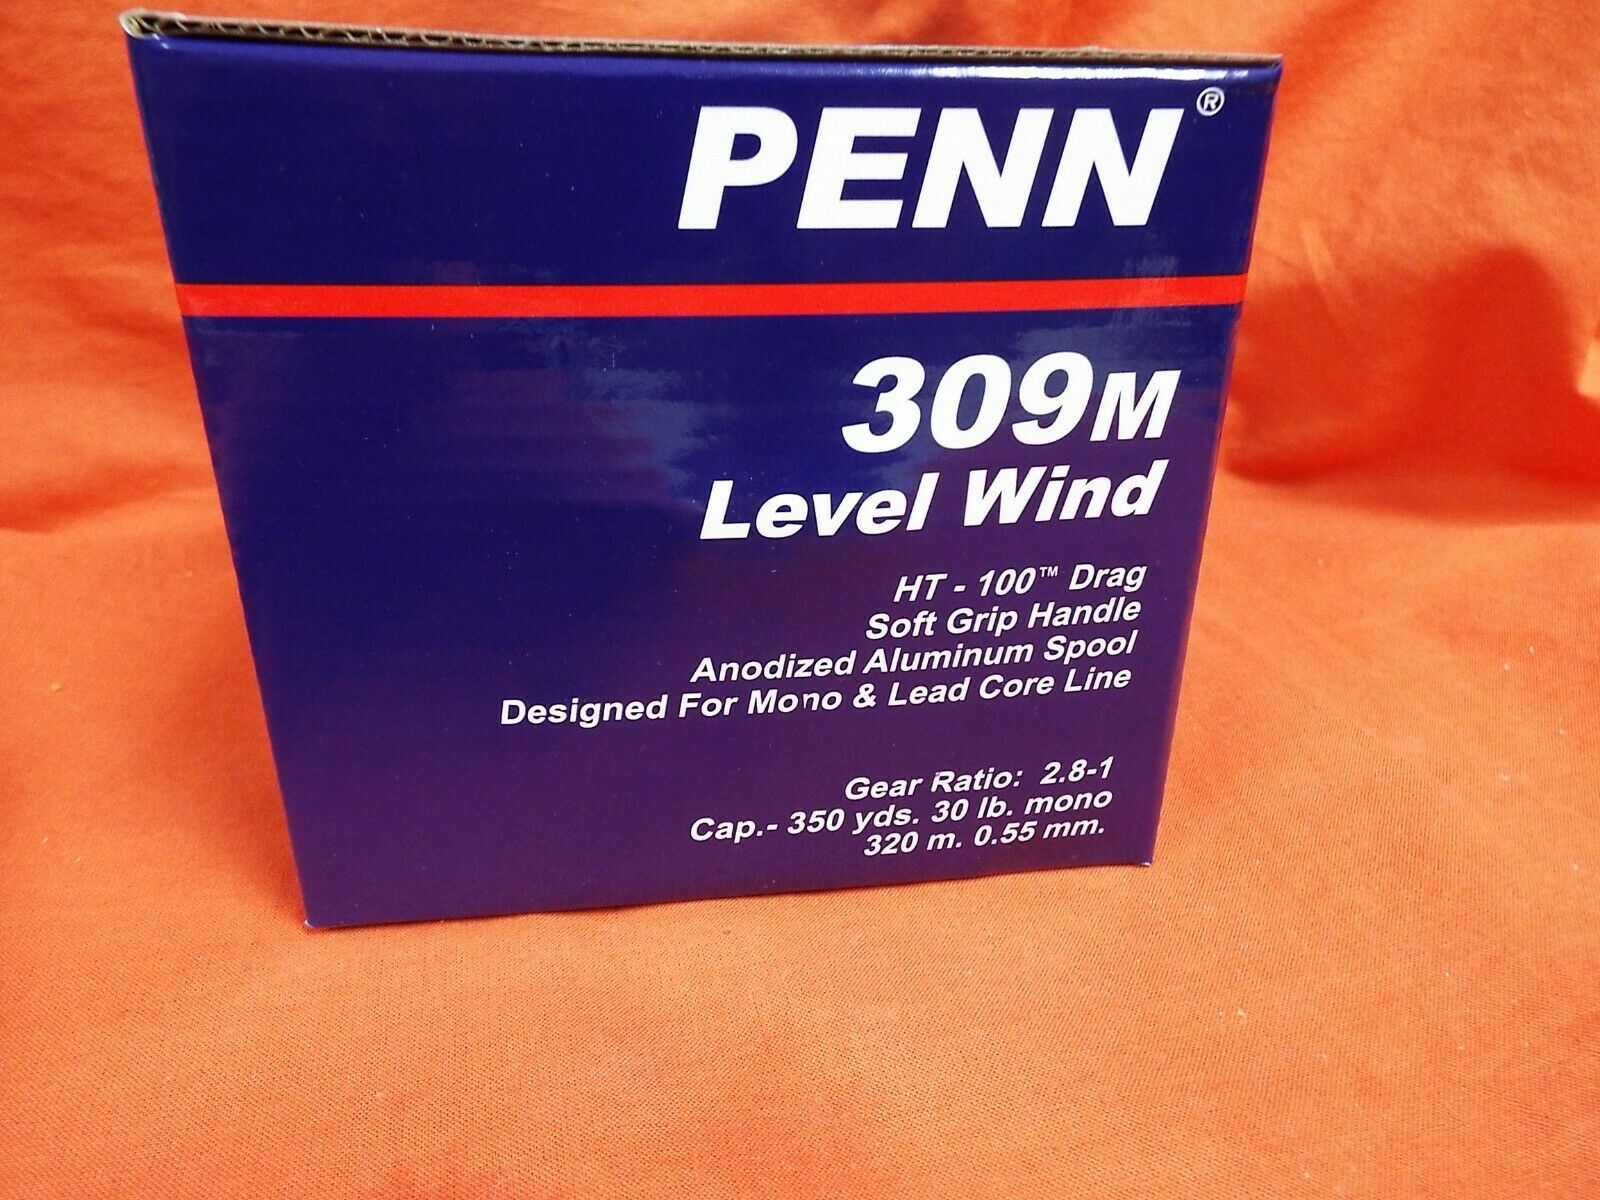 PENN 309M  LEVEL WIND GEAR RATIO 2.8 1 CONVENTIONAL REEL